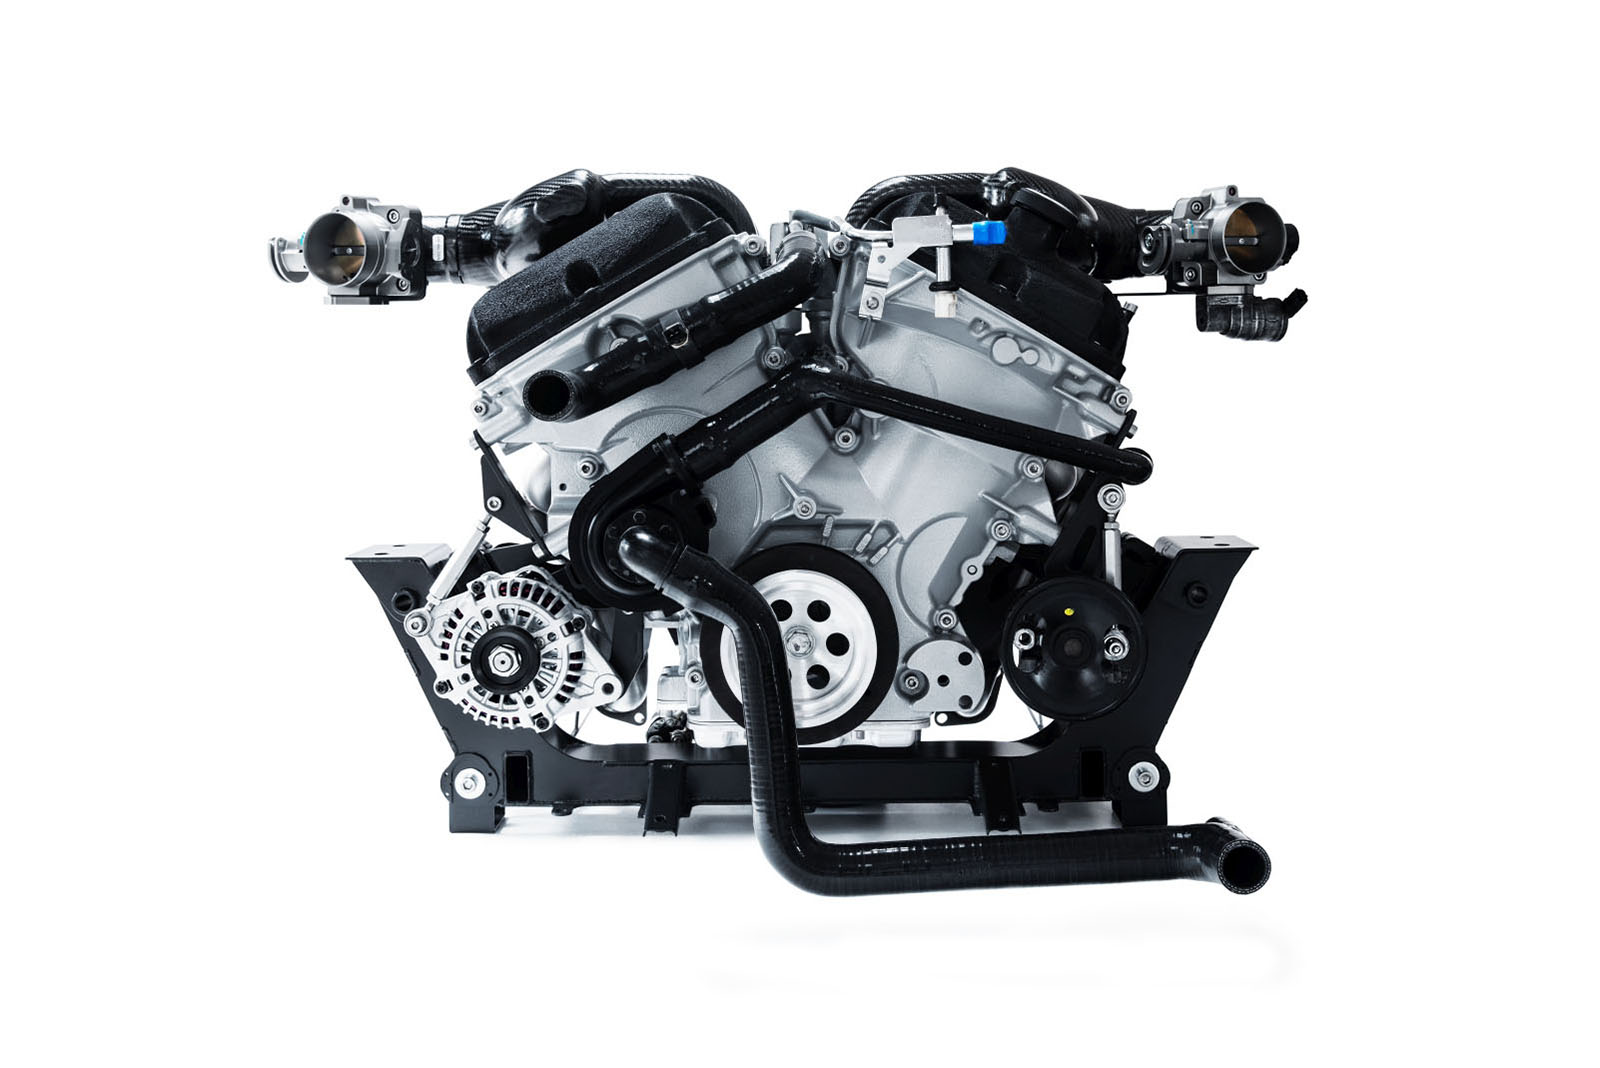 jag reincarnation garage attack type engines magazine c replica jaguar heritage